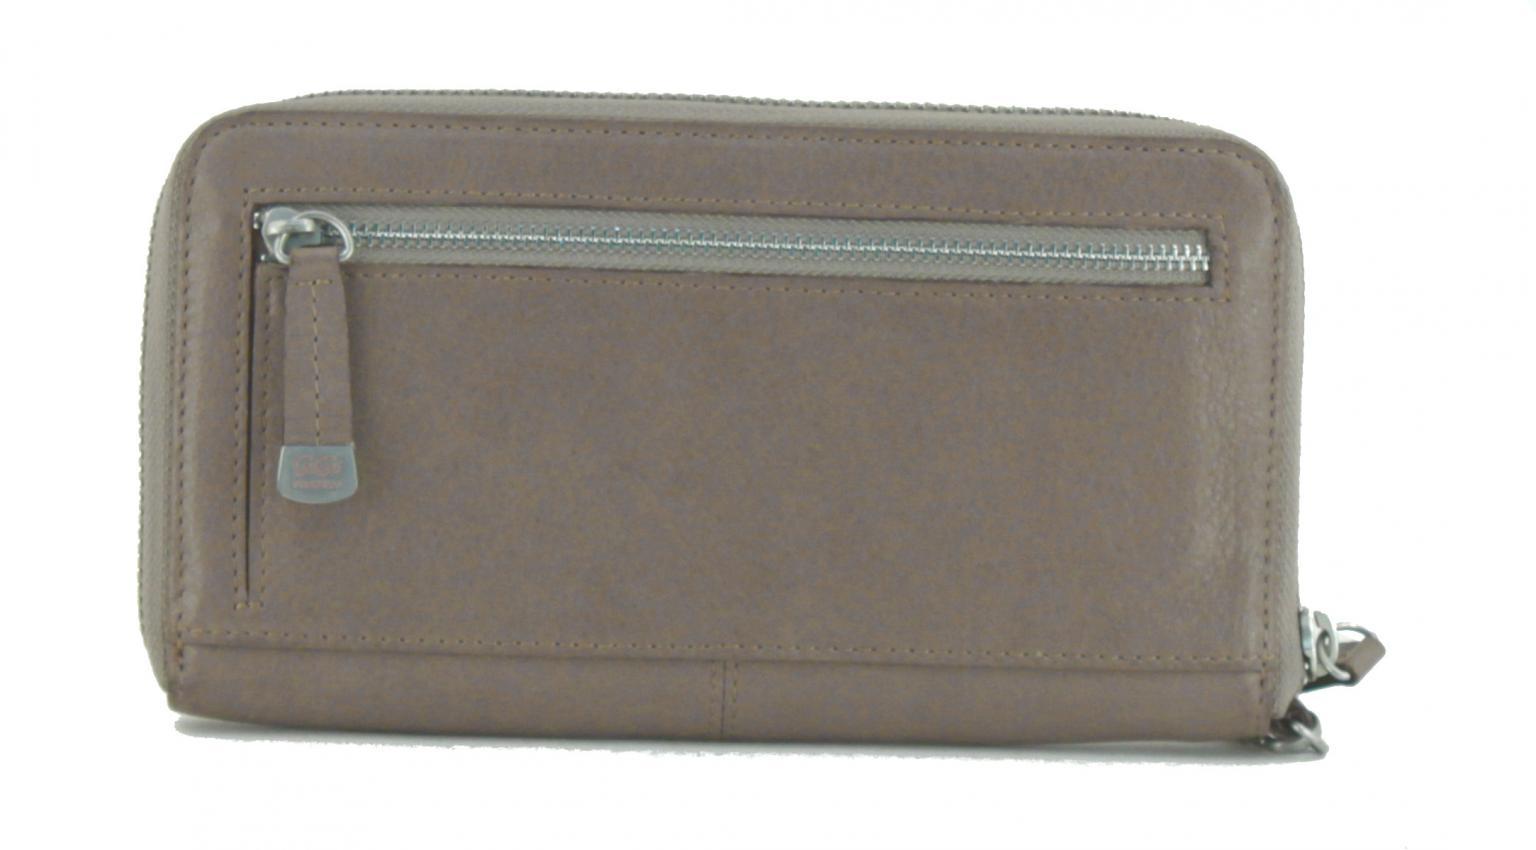 GiGi Fratelli Damenportmonee mit Überschlag taupe grau